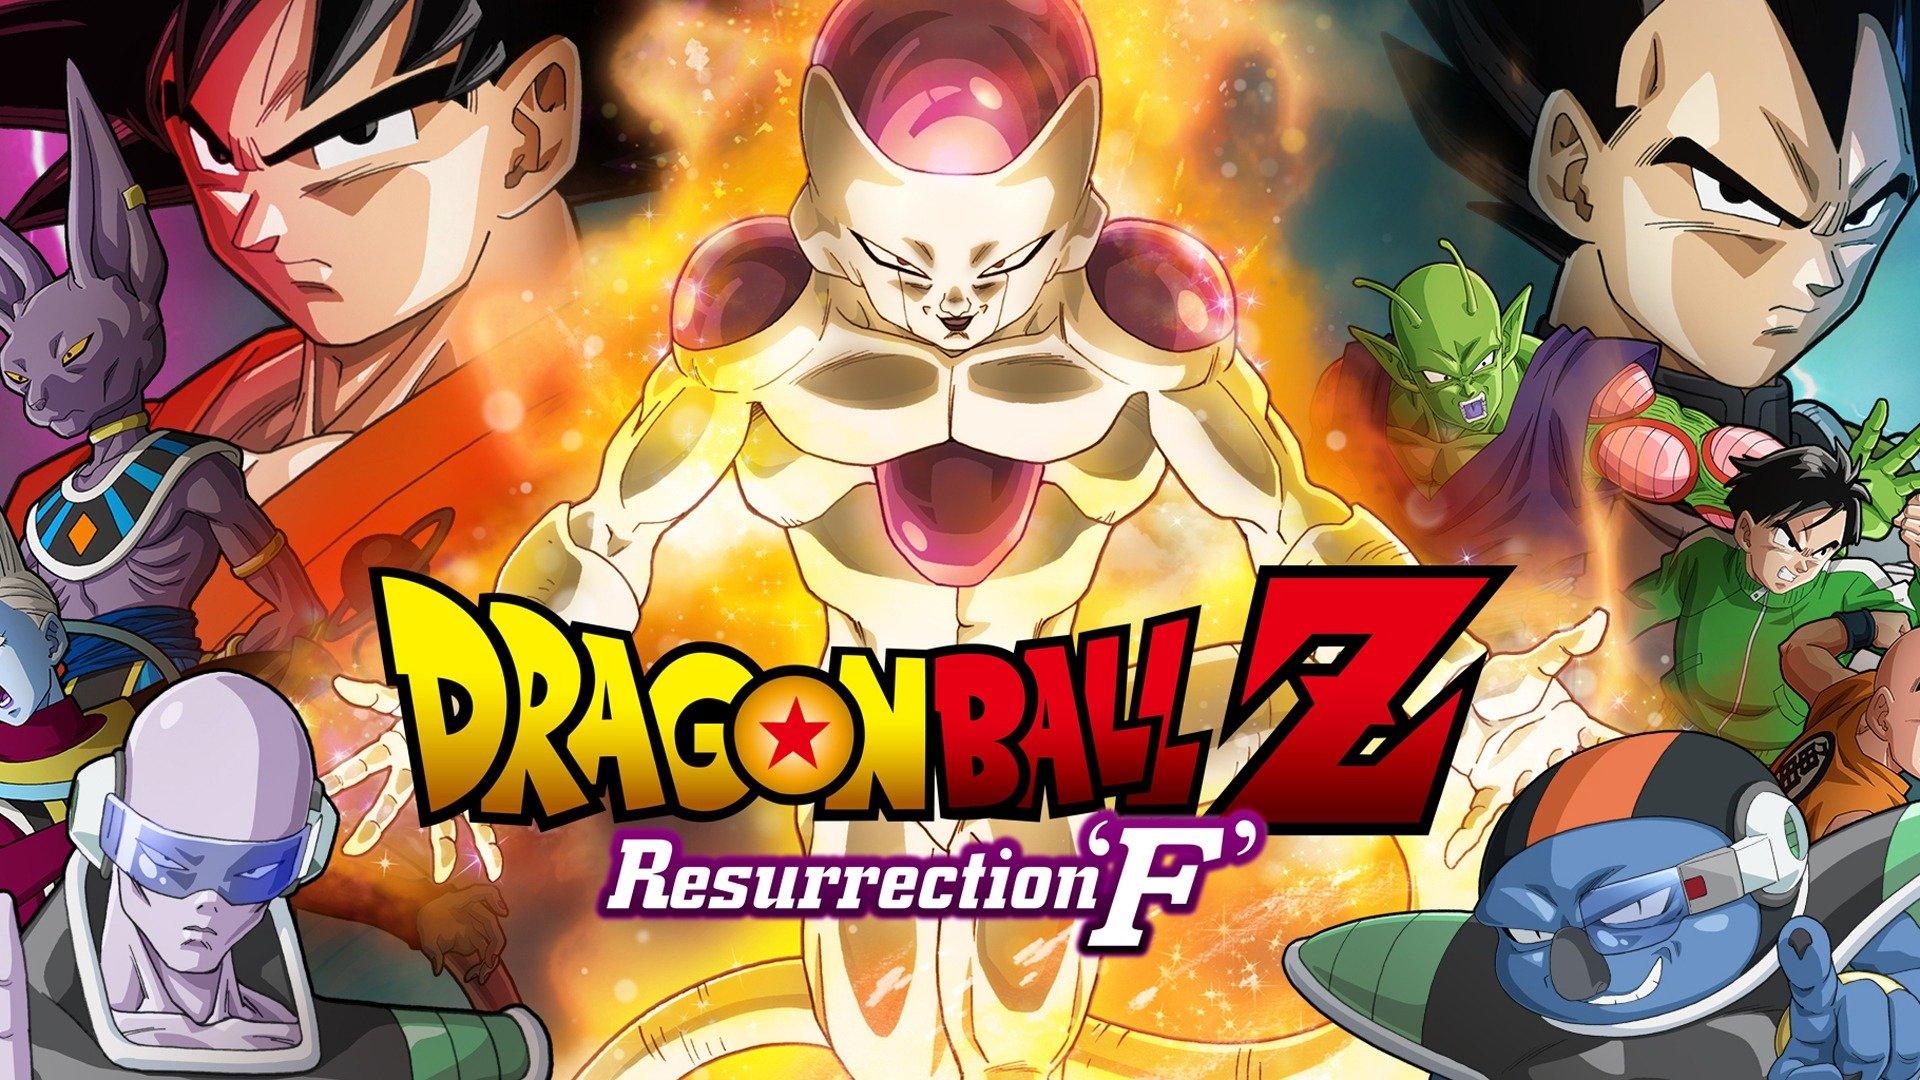 Dragon Ball Z Resurrection F Movietickets